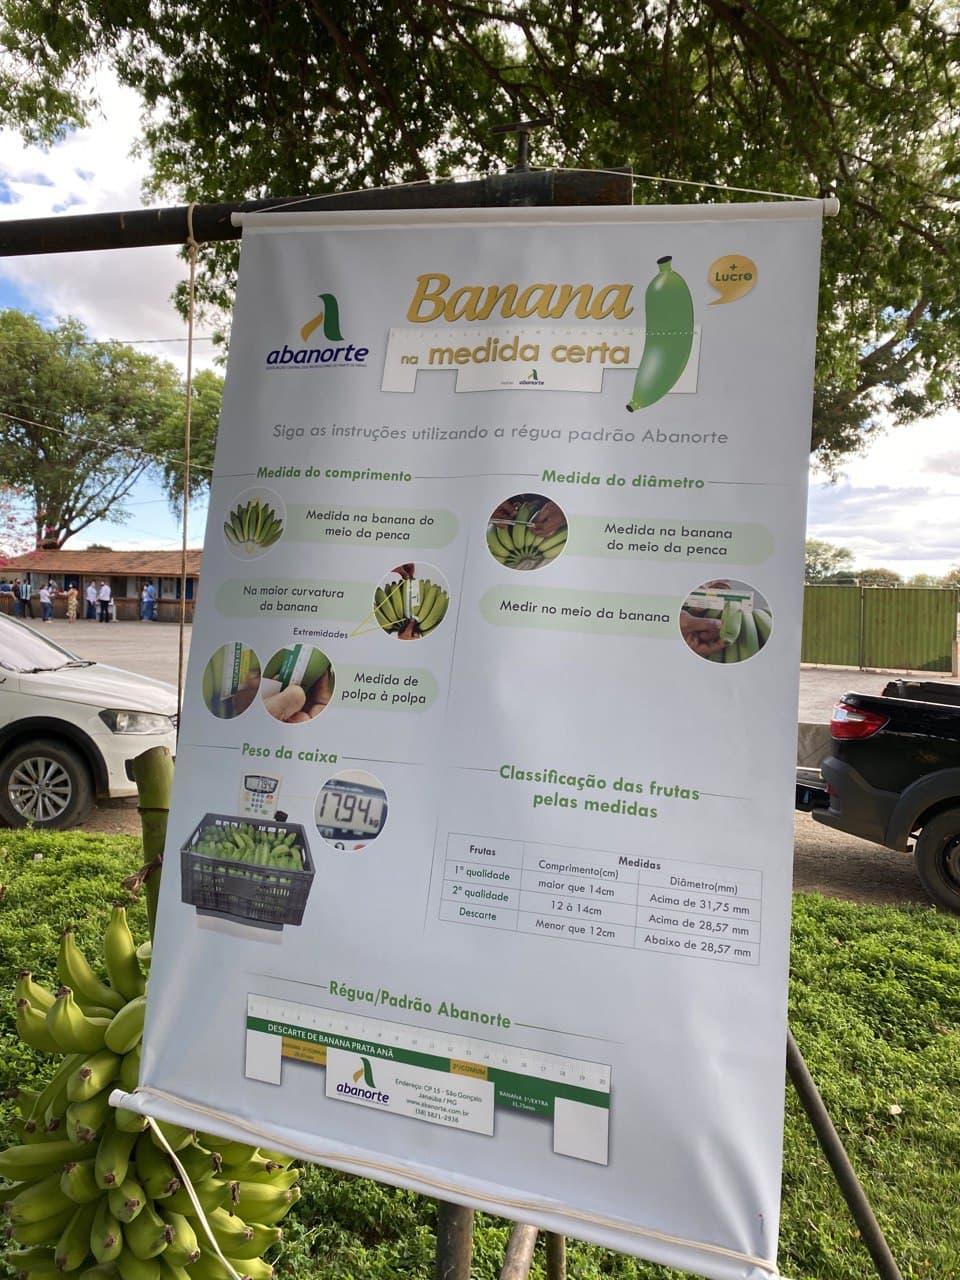 Projeto-Banana-na-Medida-Certa